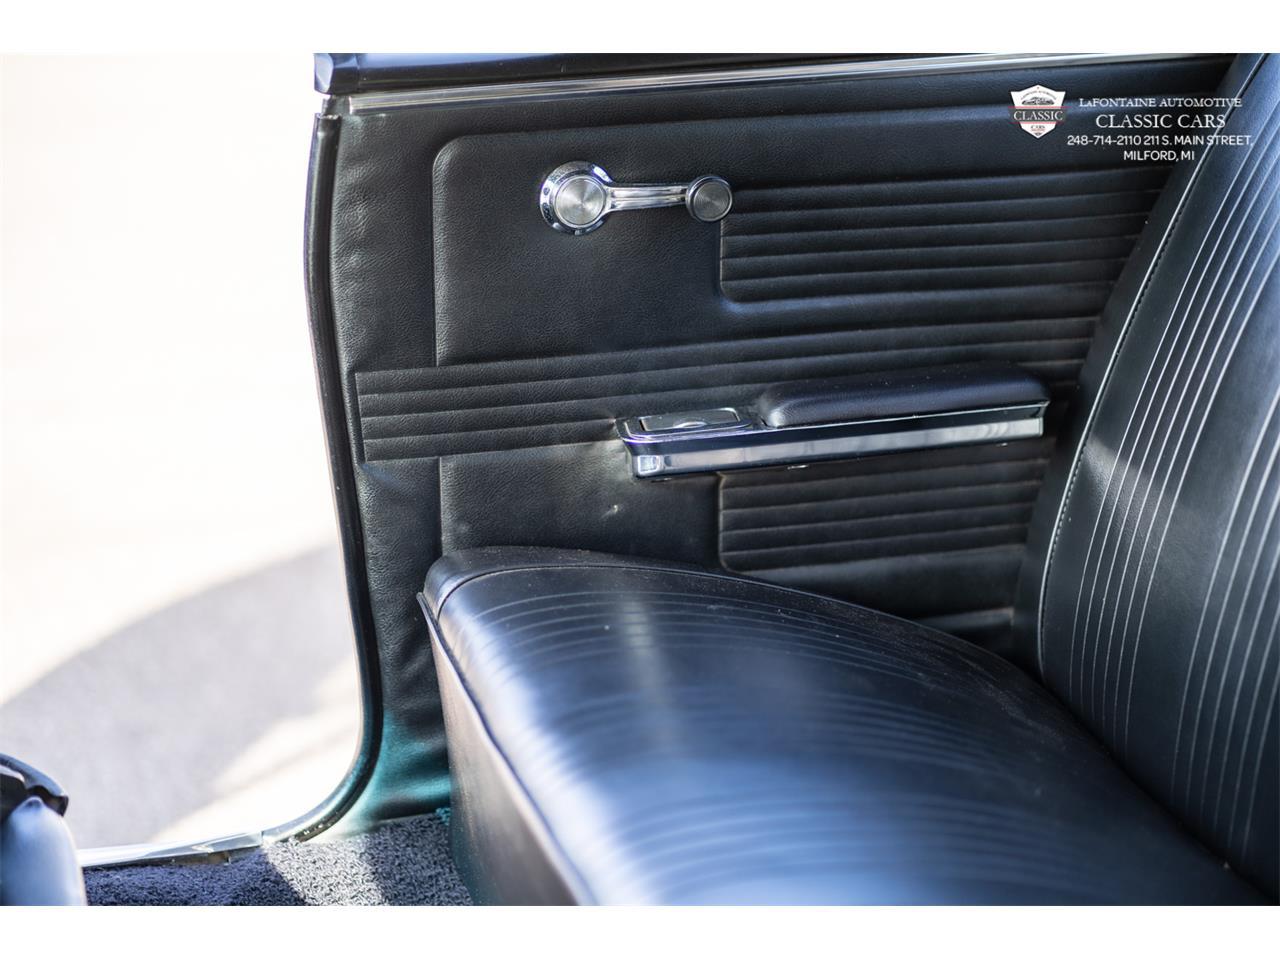 1967 Pontiac GTO (CC-1392579) for sale in Milford, Michigan